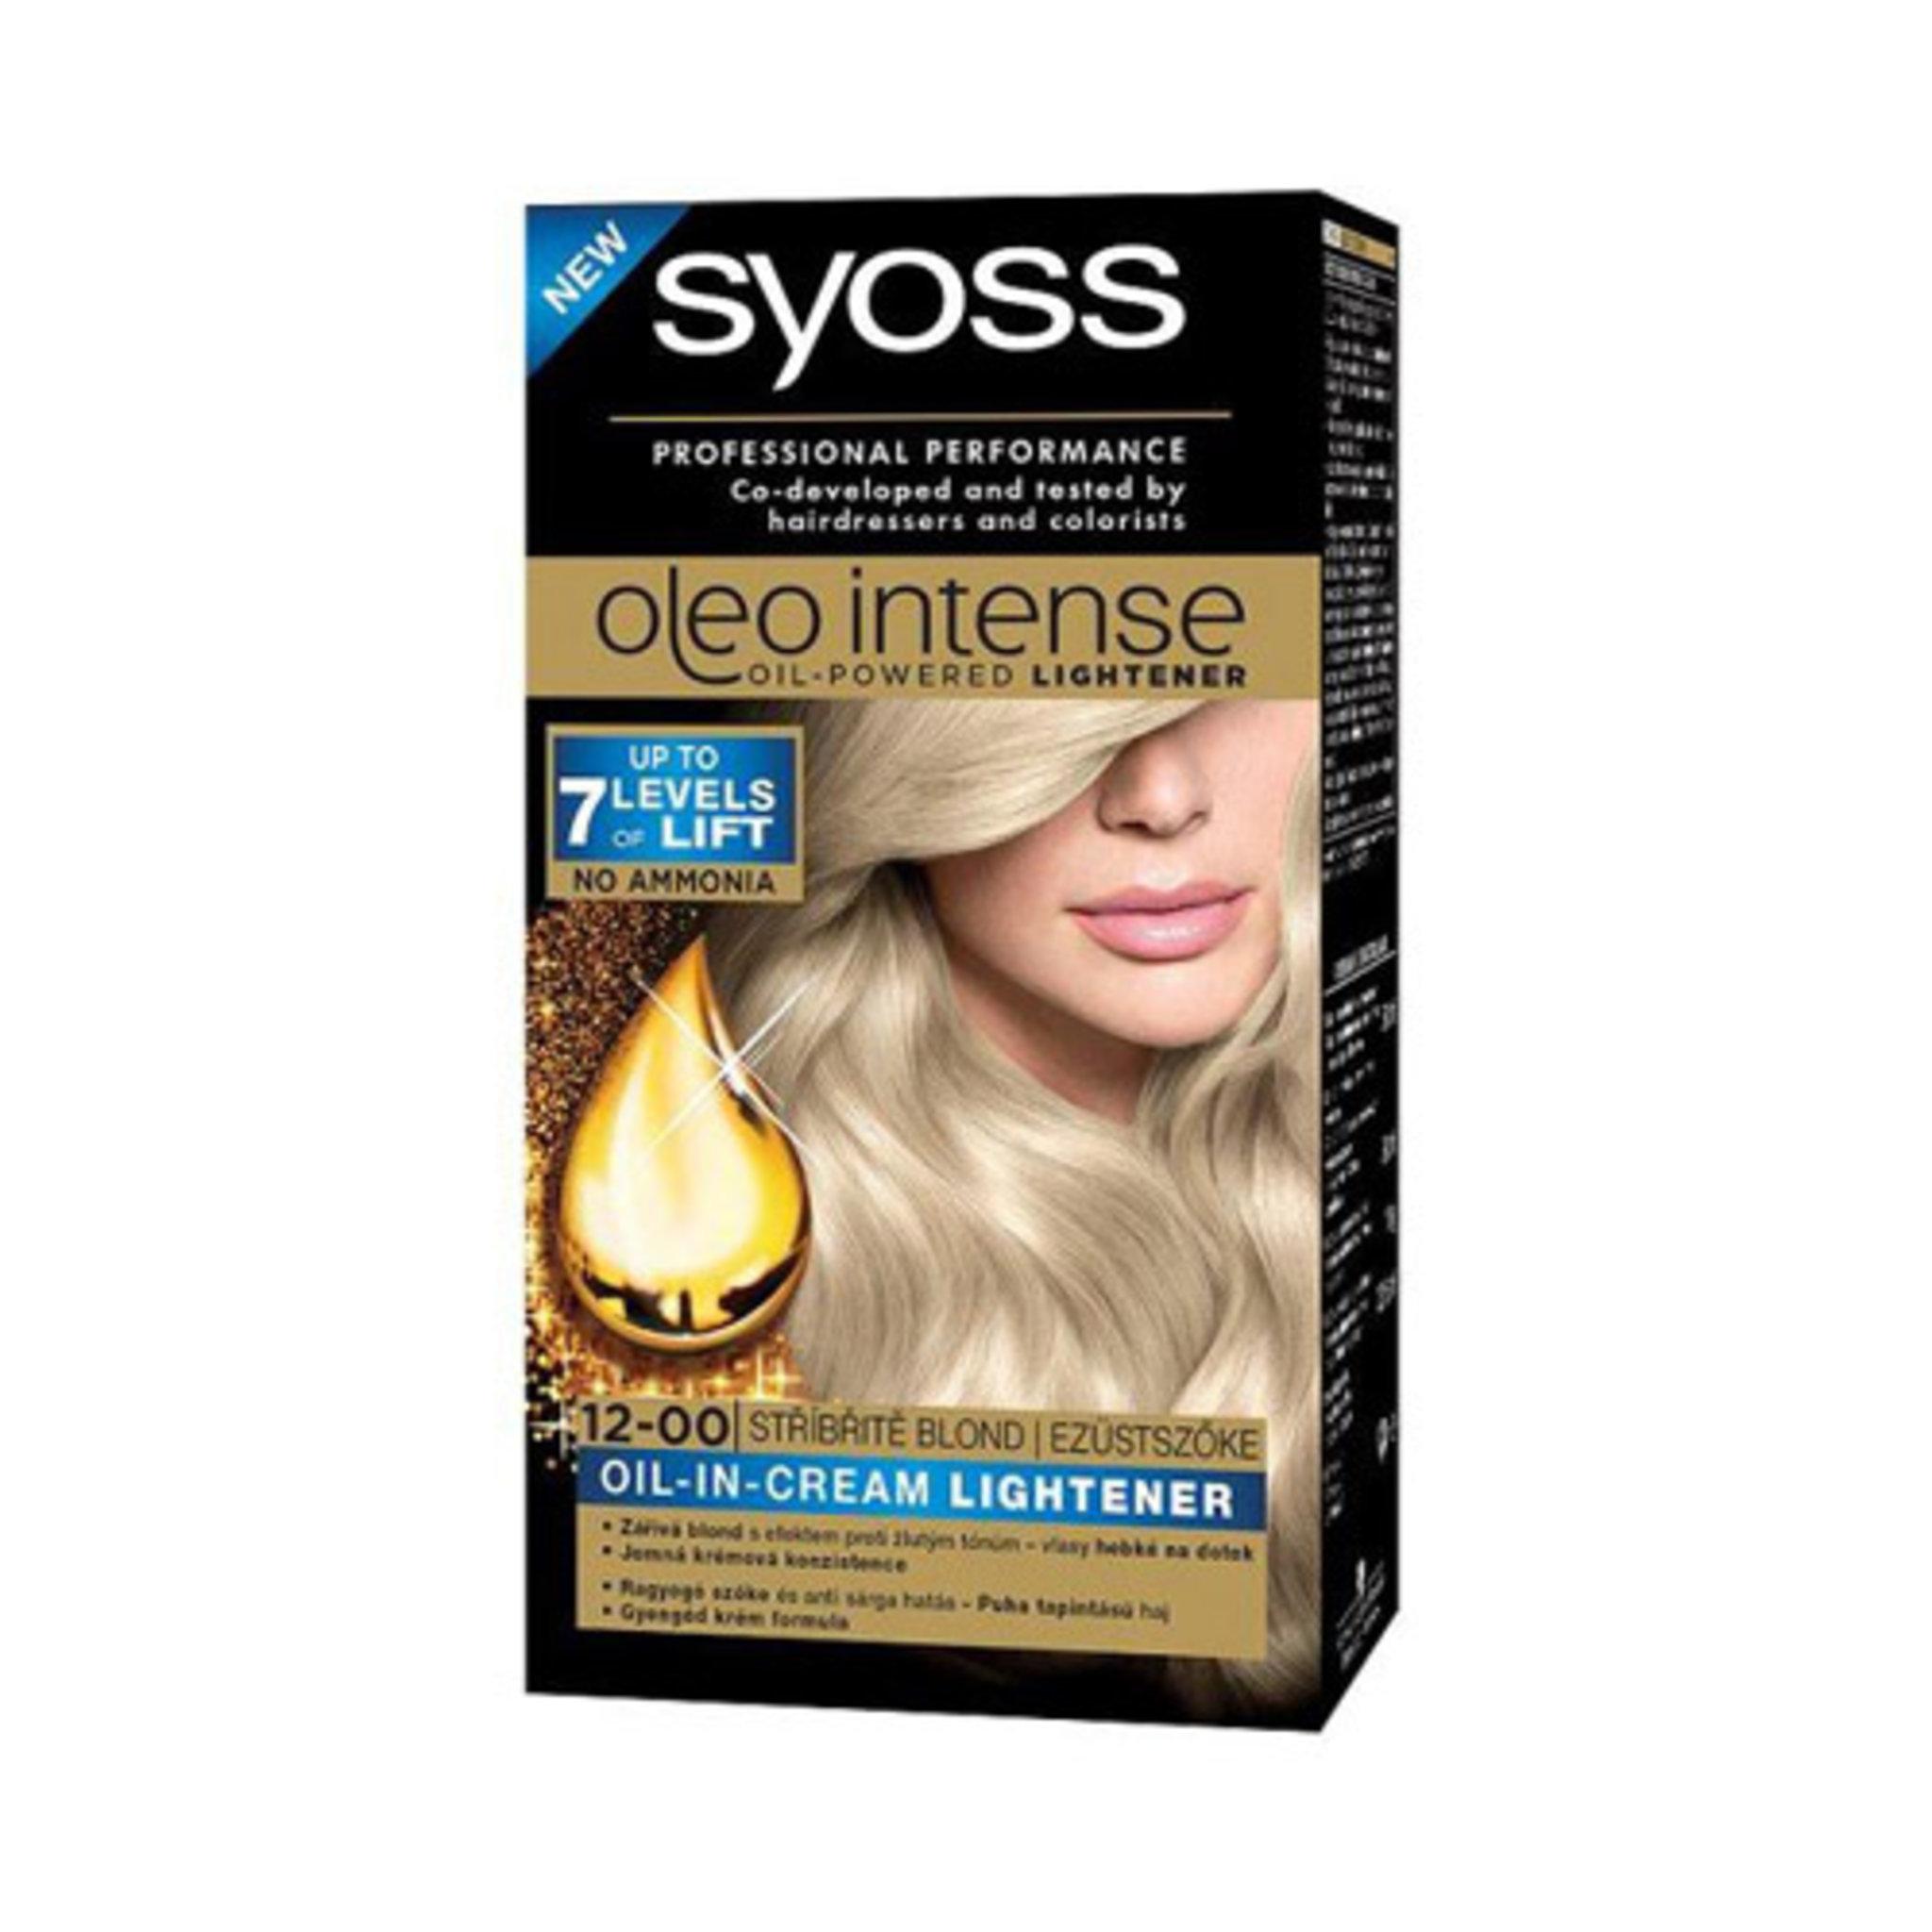 syoss hårfärg blond